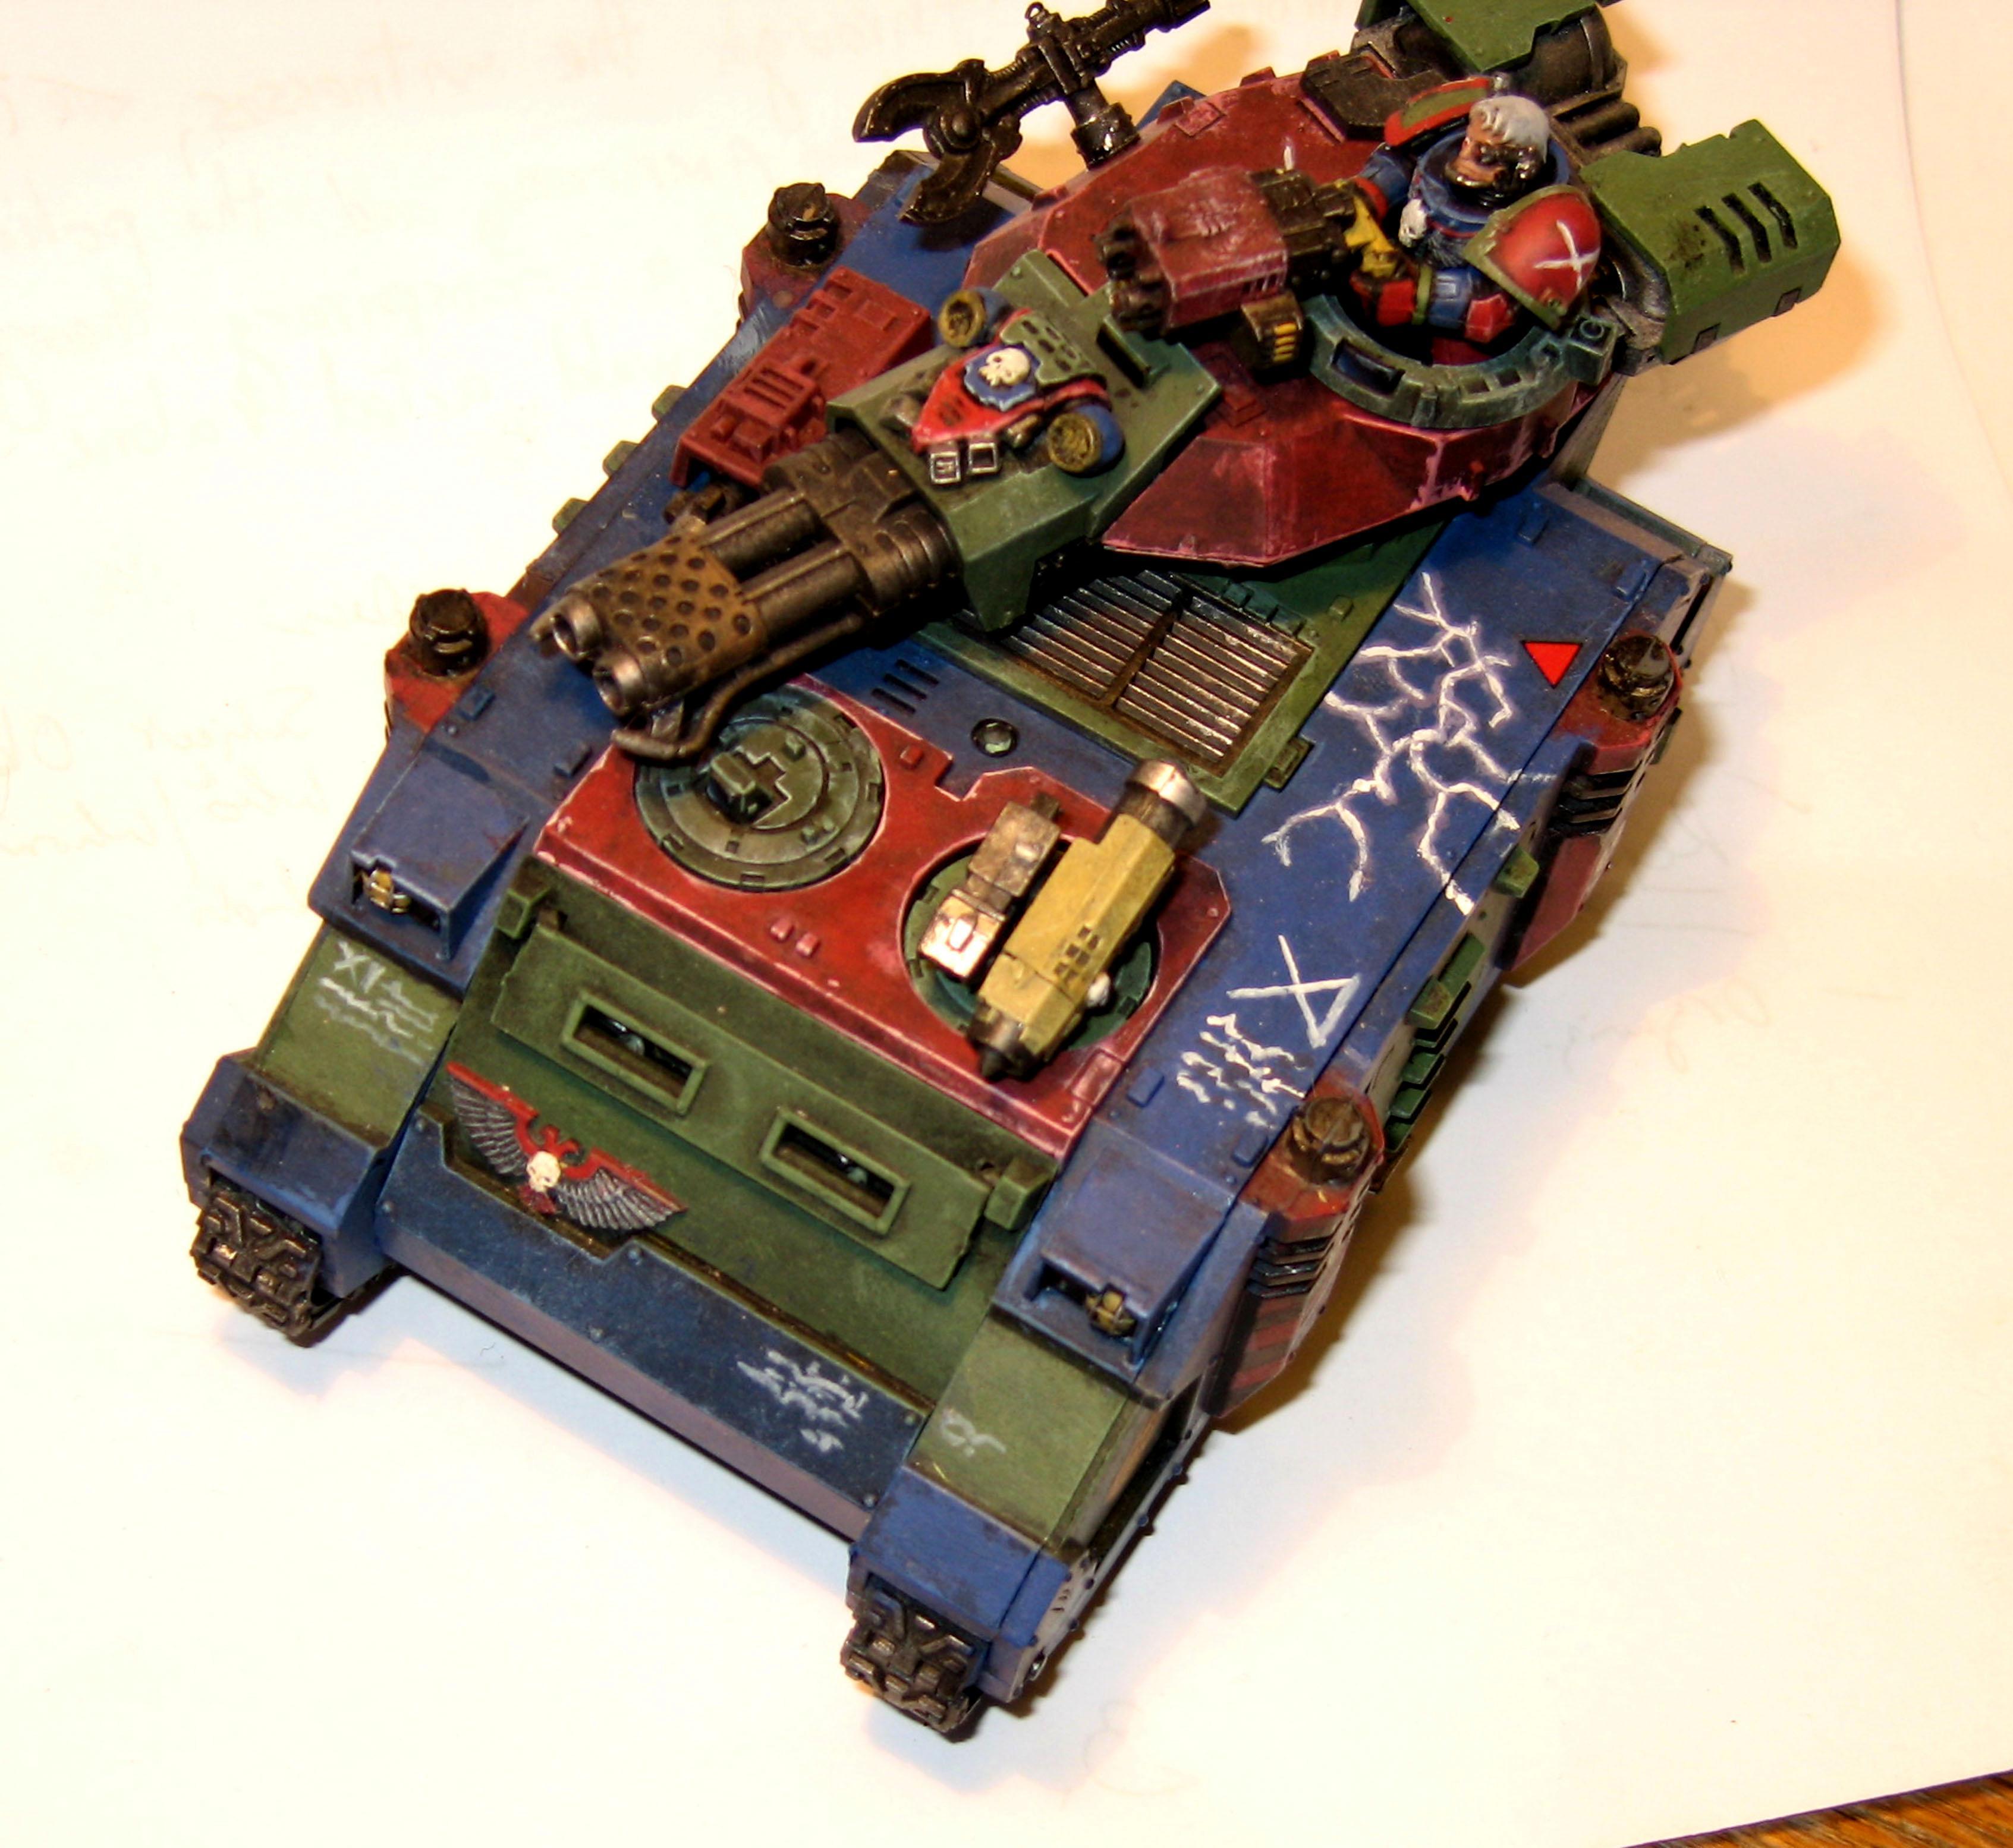 Raven Claws, Rhino, Space Marines, Warhammer 40,000